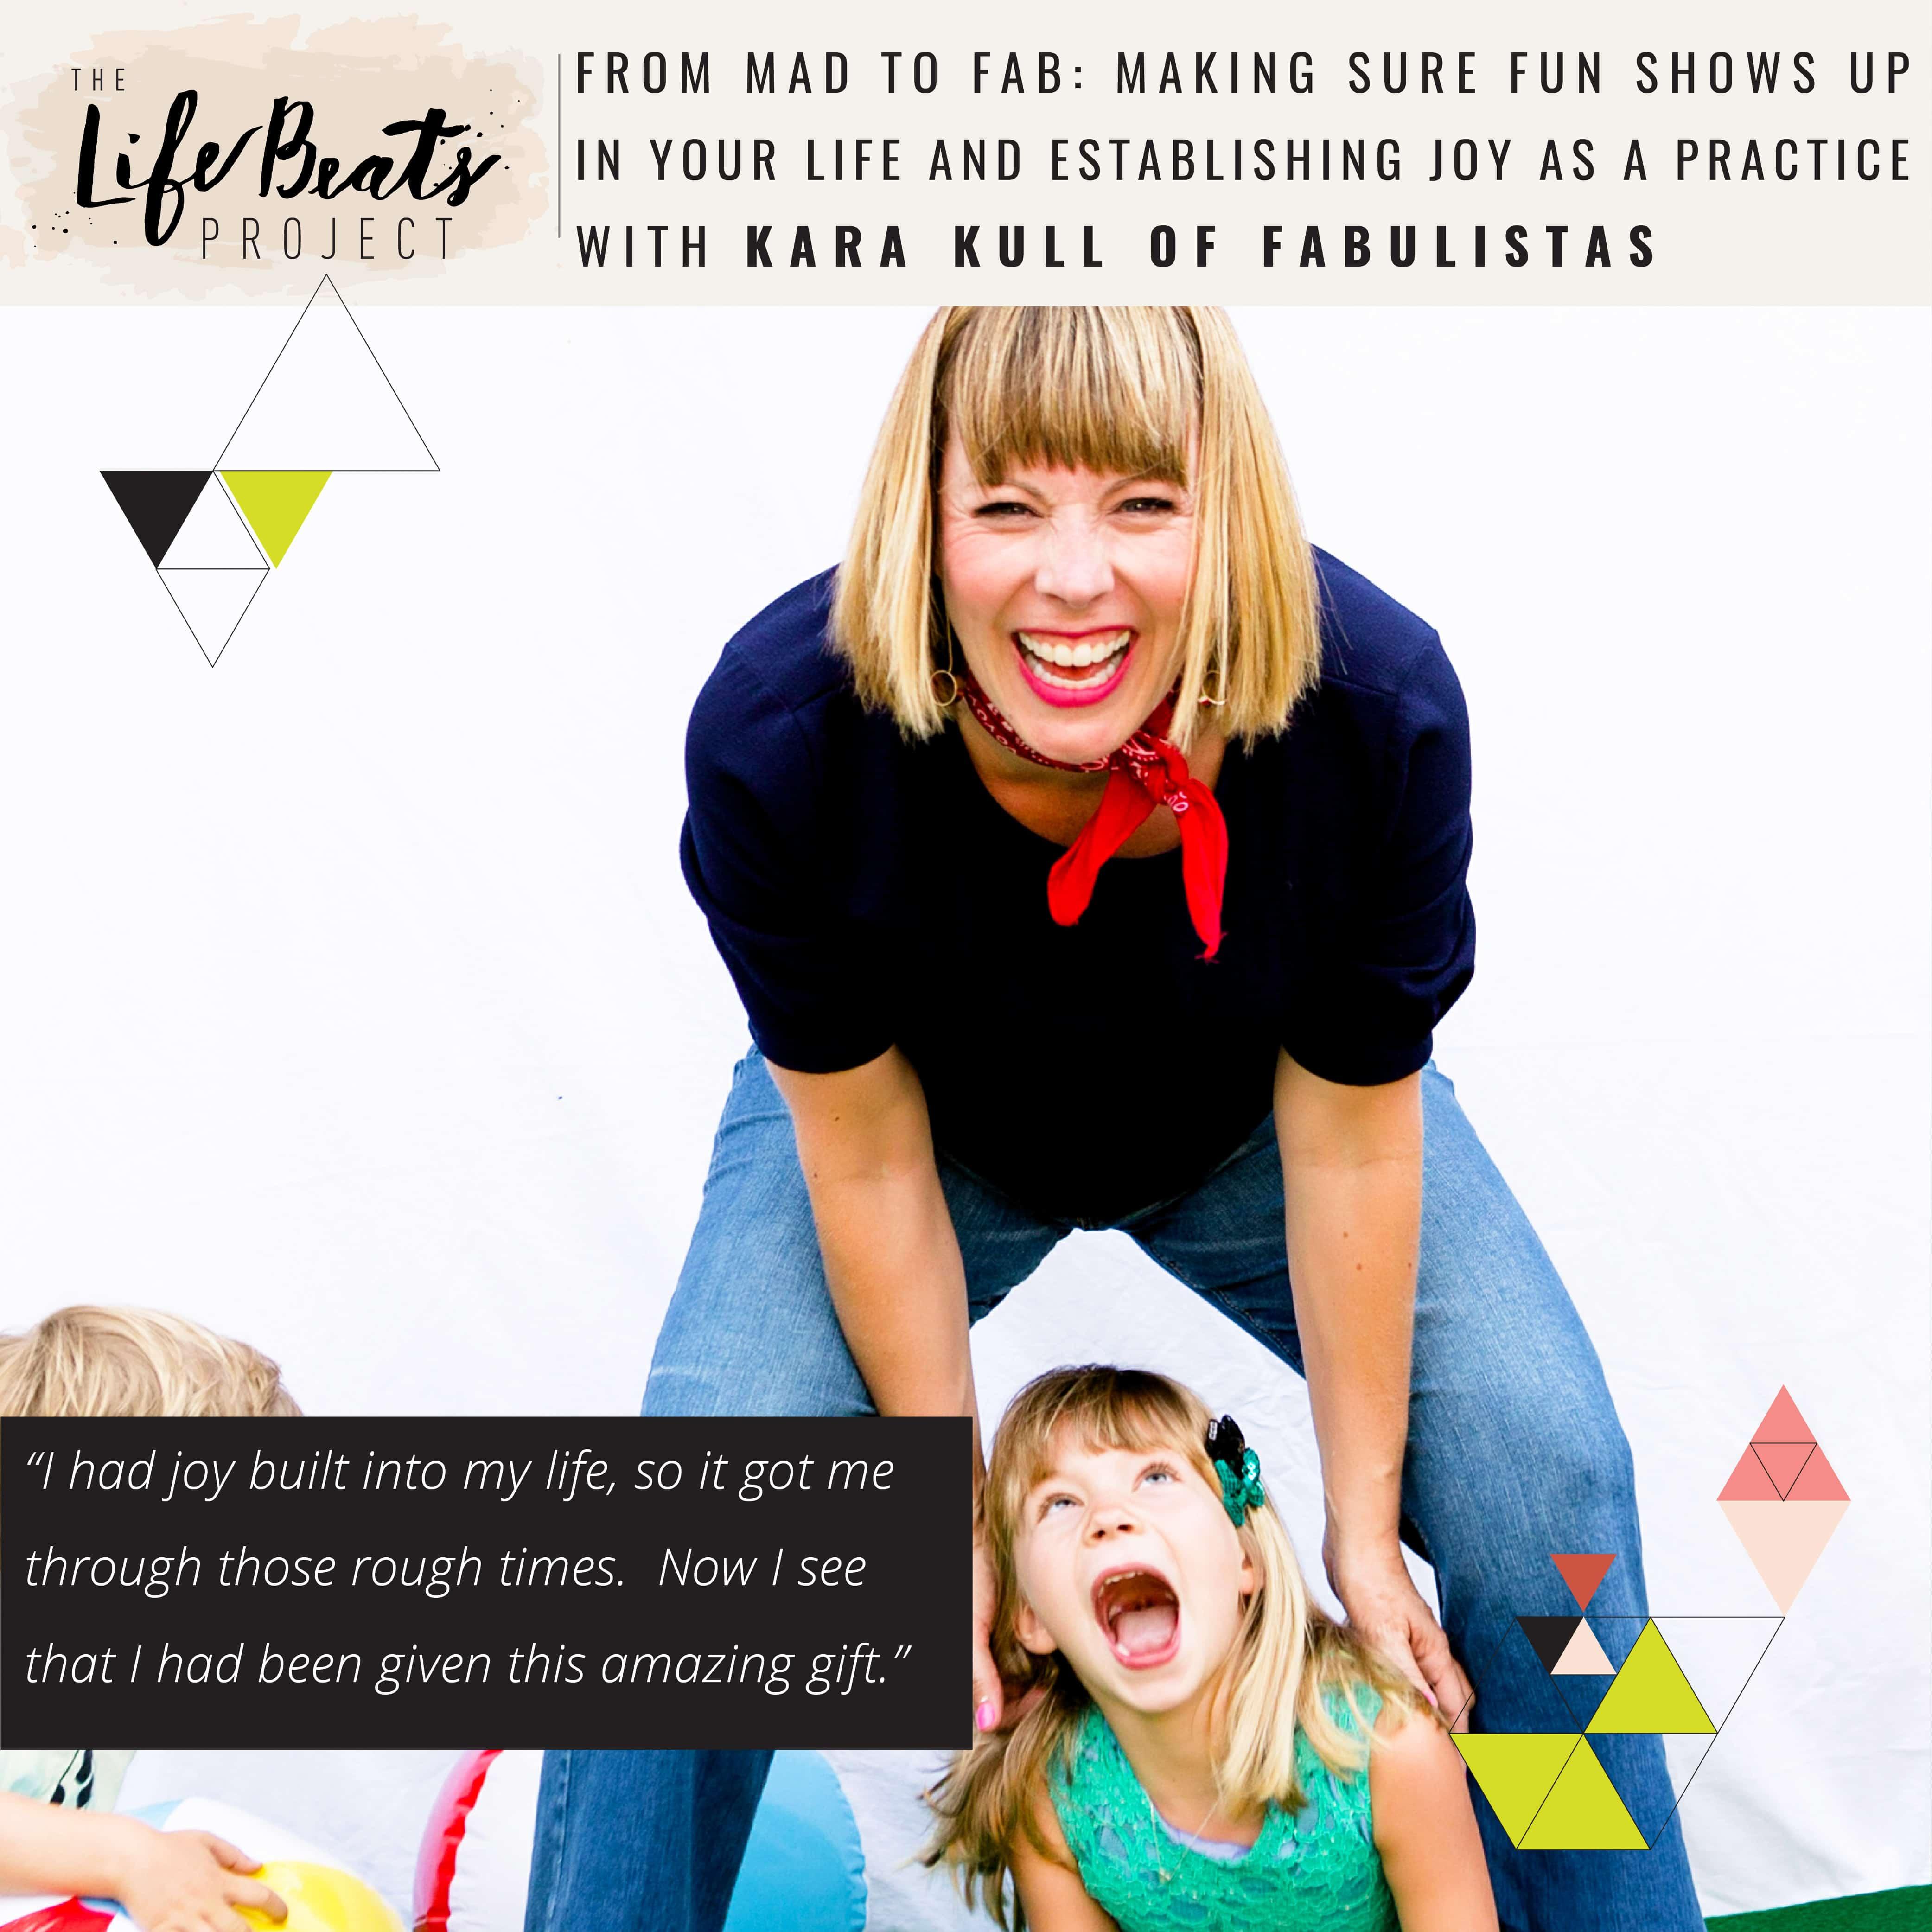 having fun practice joy anger depression motherhood fun with kids podcast